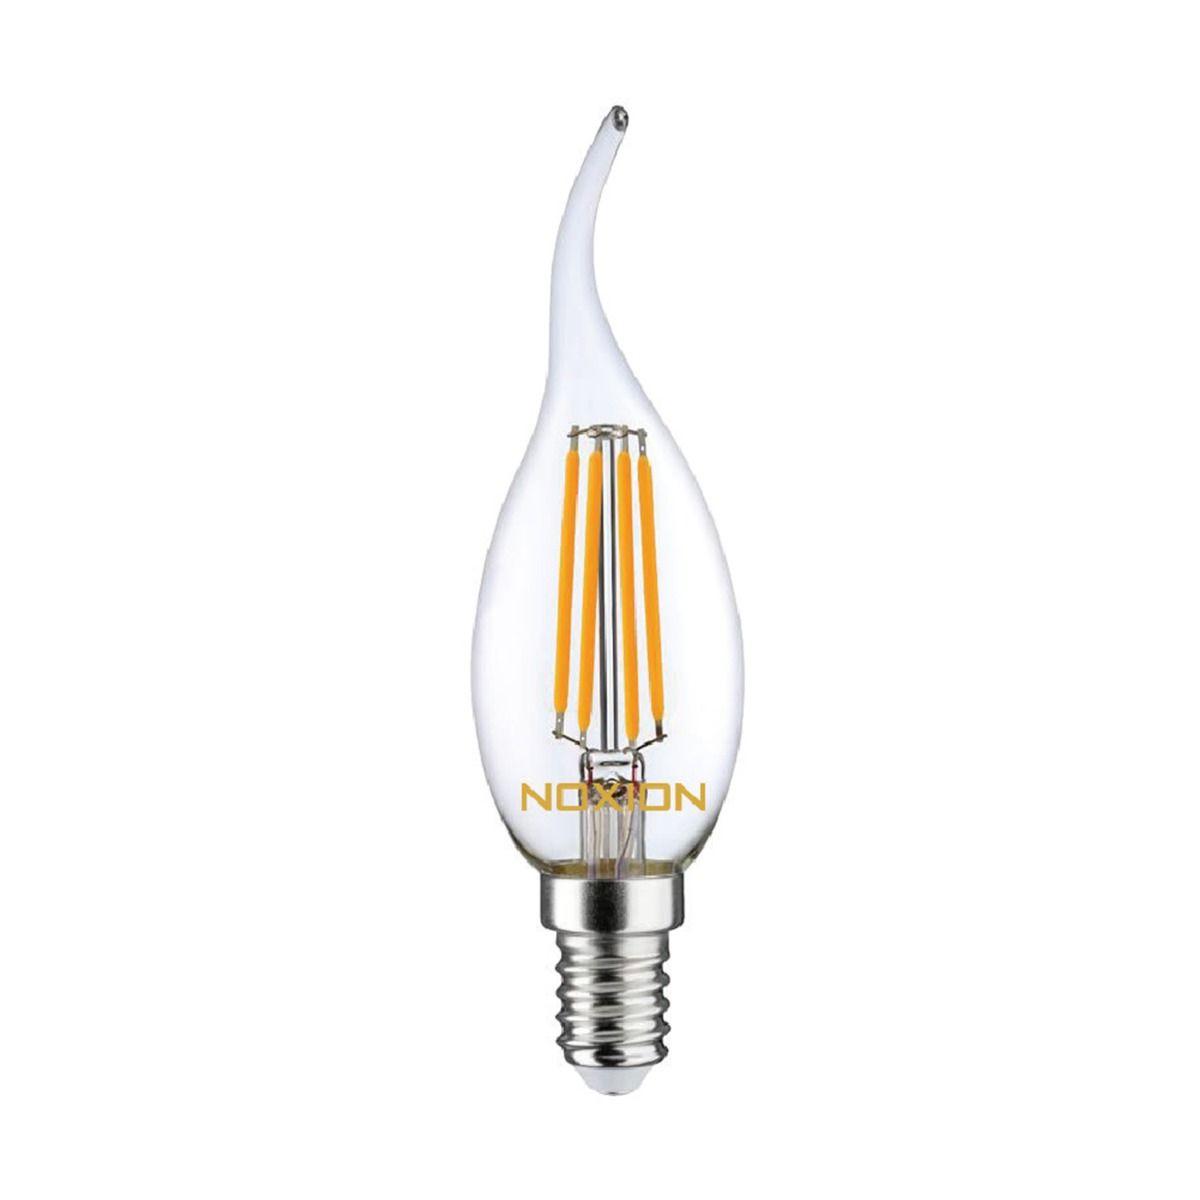 Noxion Lucent Filament LED Candle 4.5W 827 BA35 E14 Claire   Dimmable - Remplacement 40W